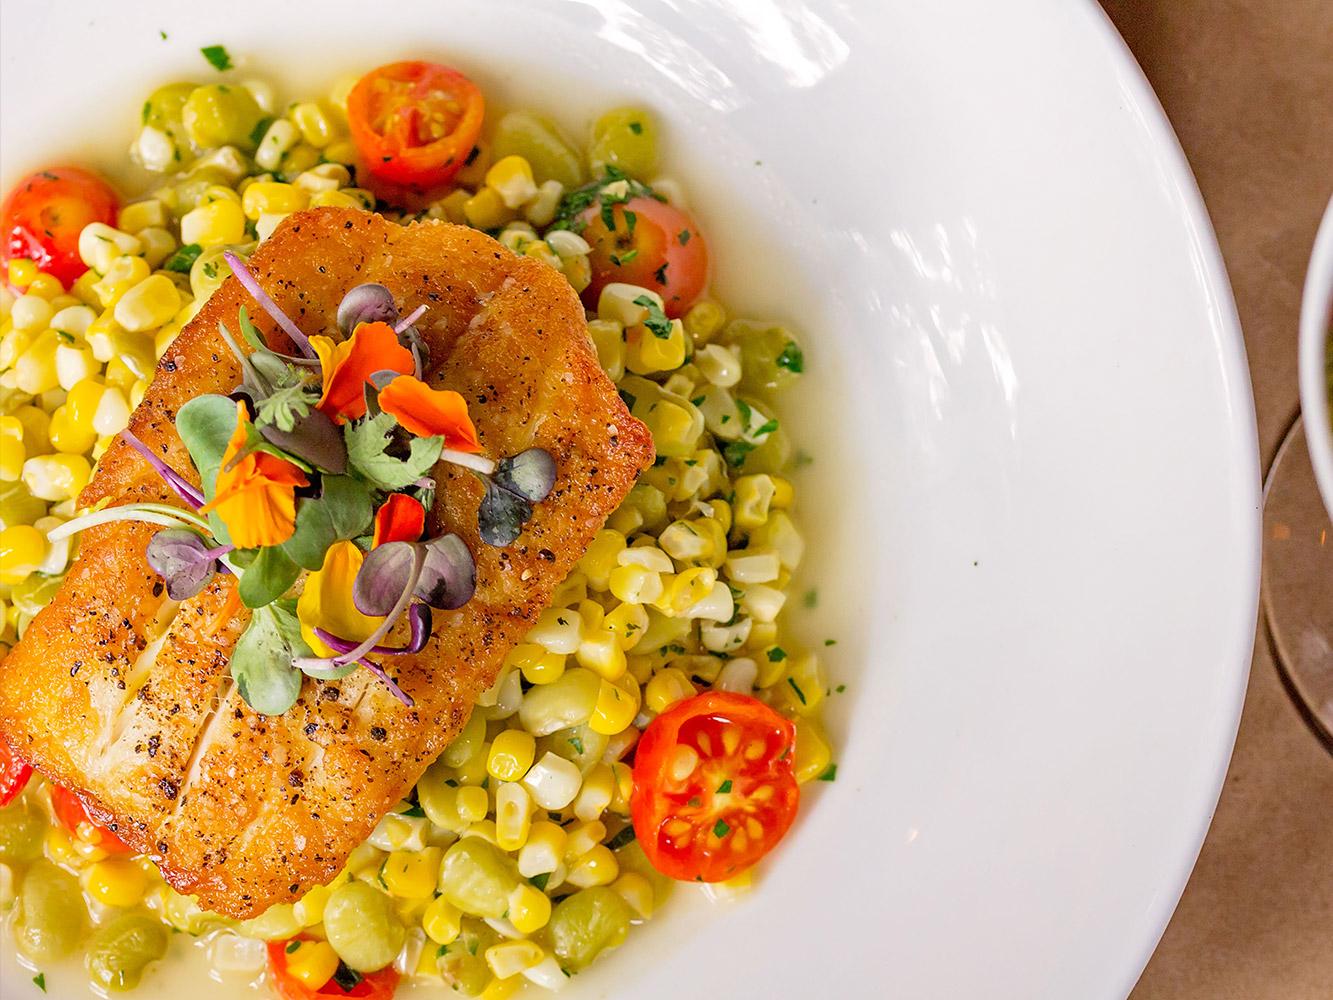 food-photography-dyrons-lowcountry-fish.jpg